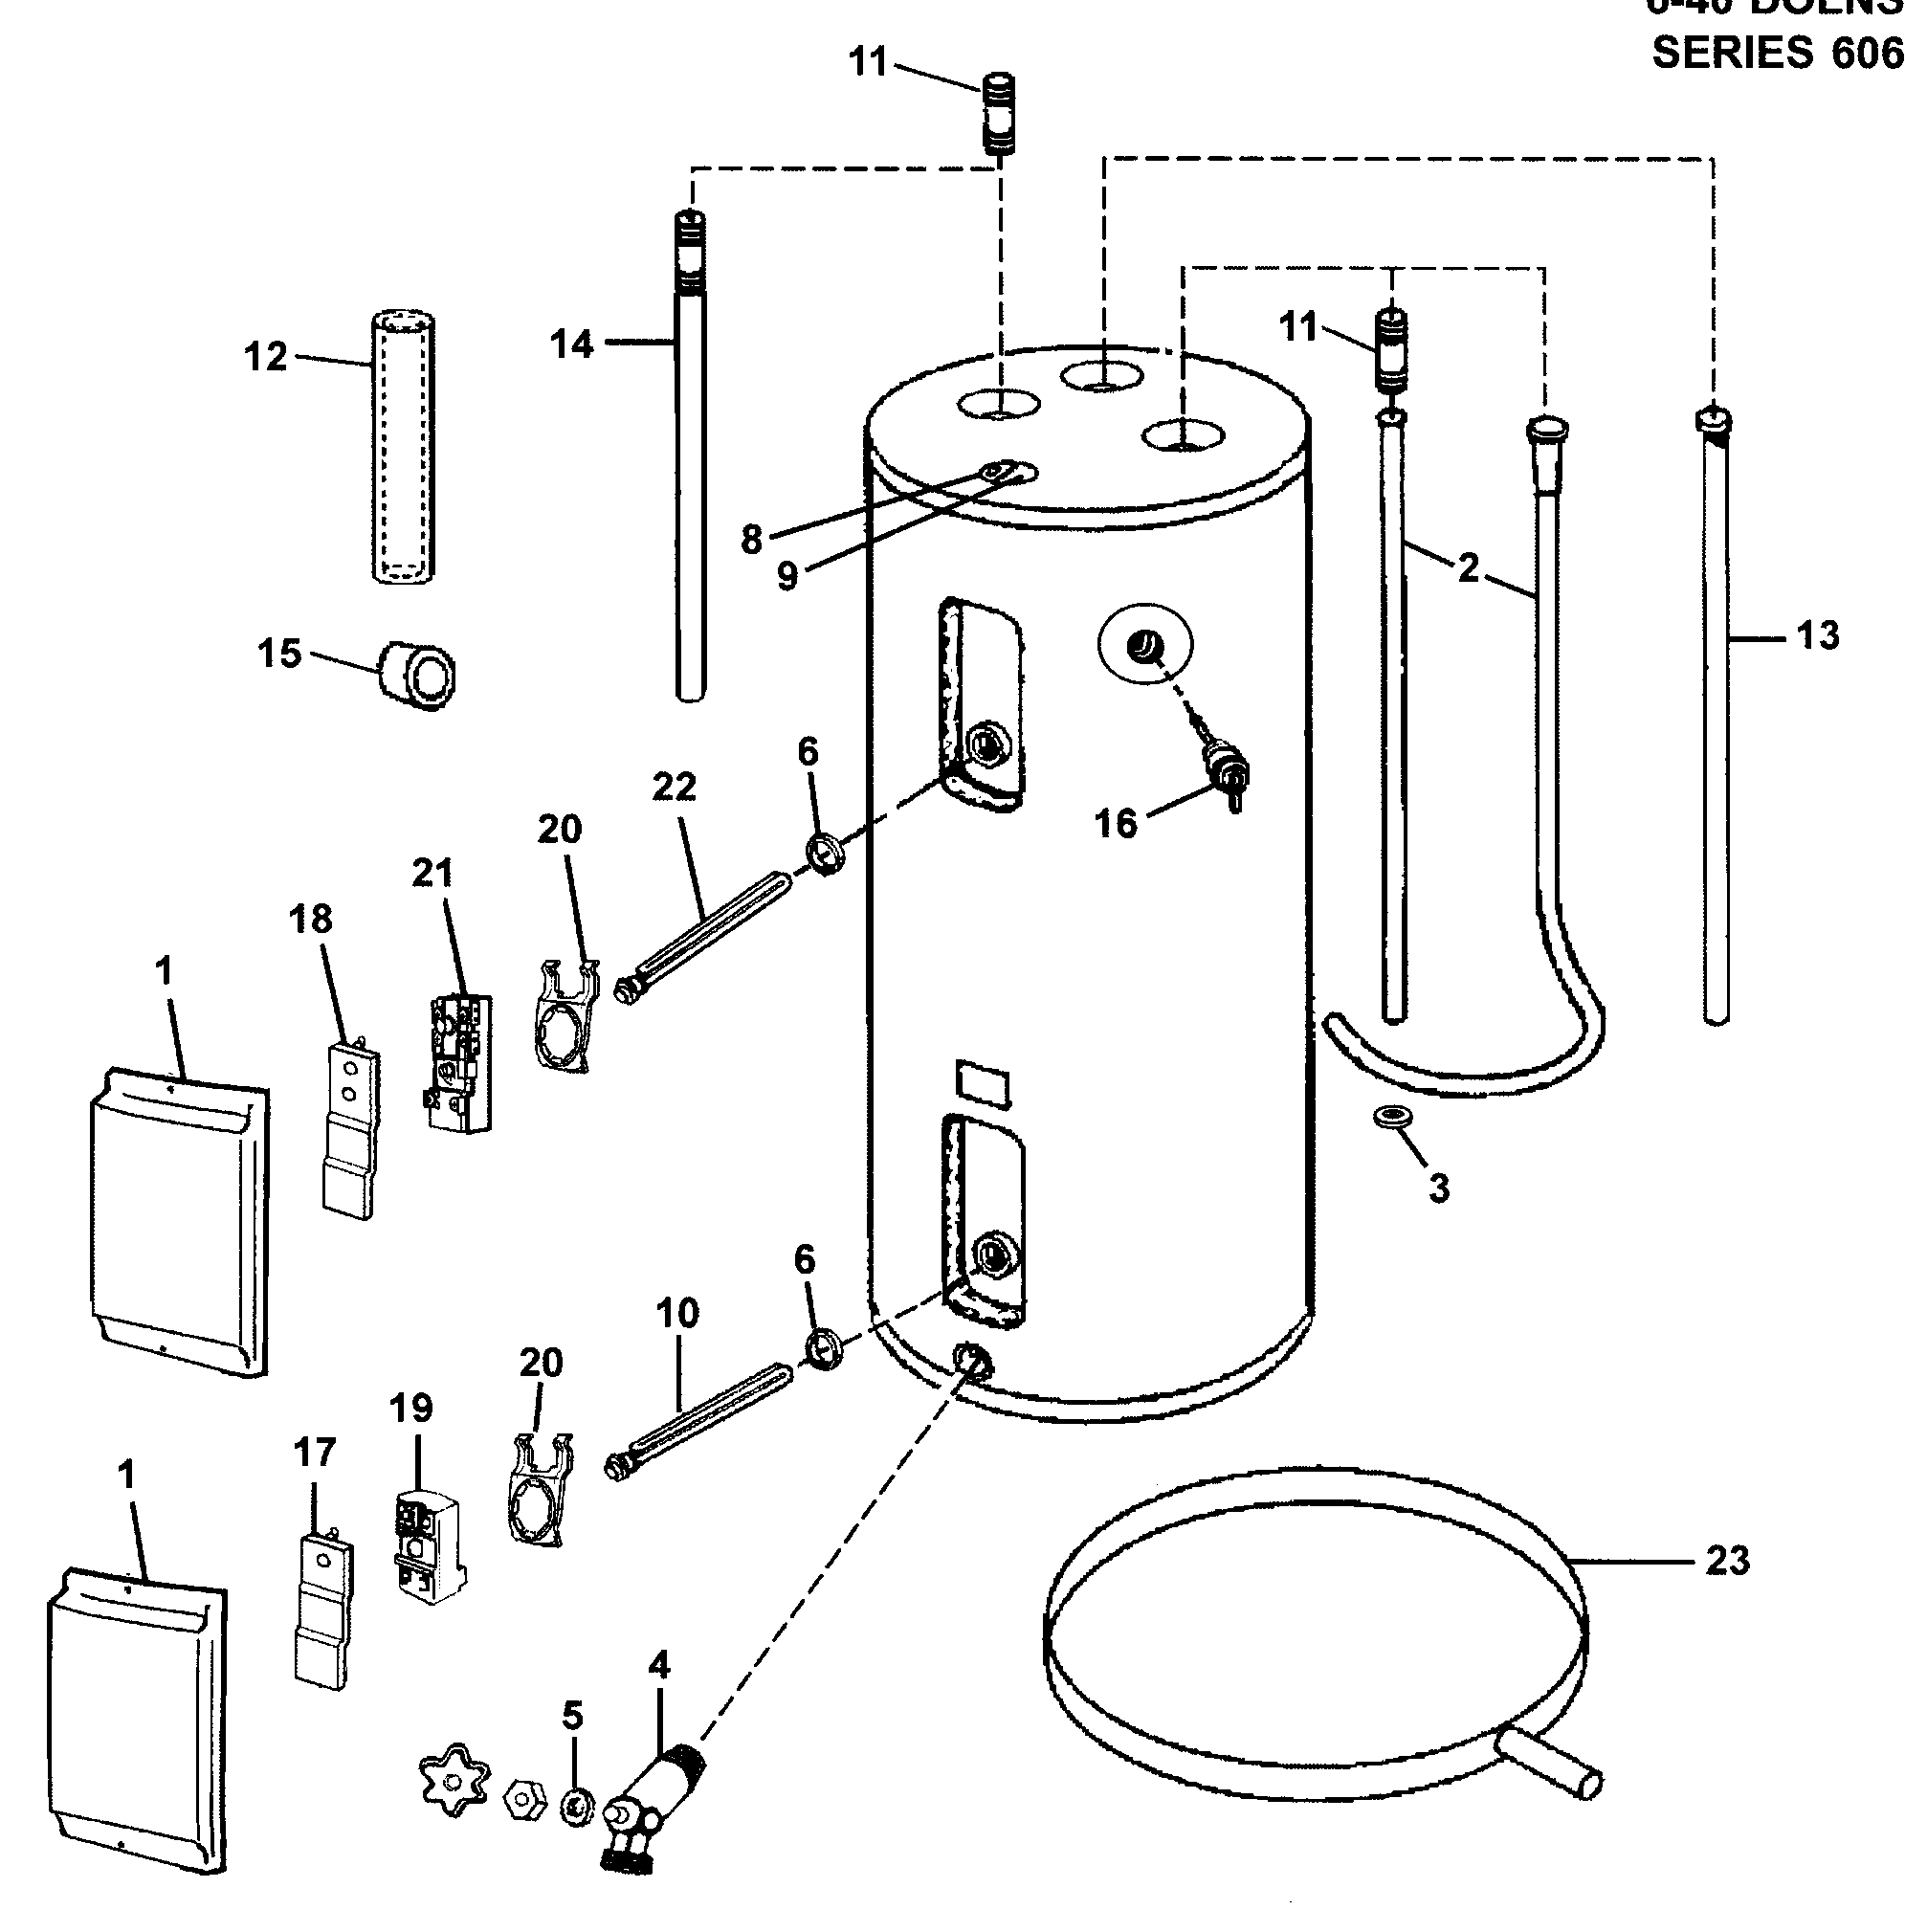 reliance model 640dort water heater electric genuine parts rh searspartsdirect com